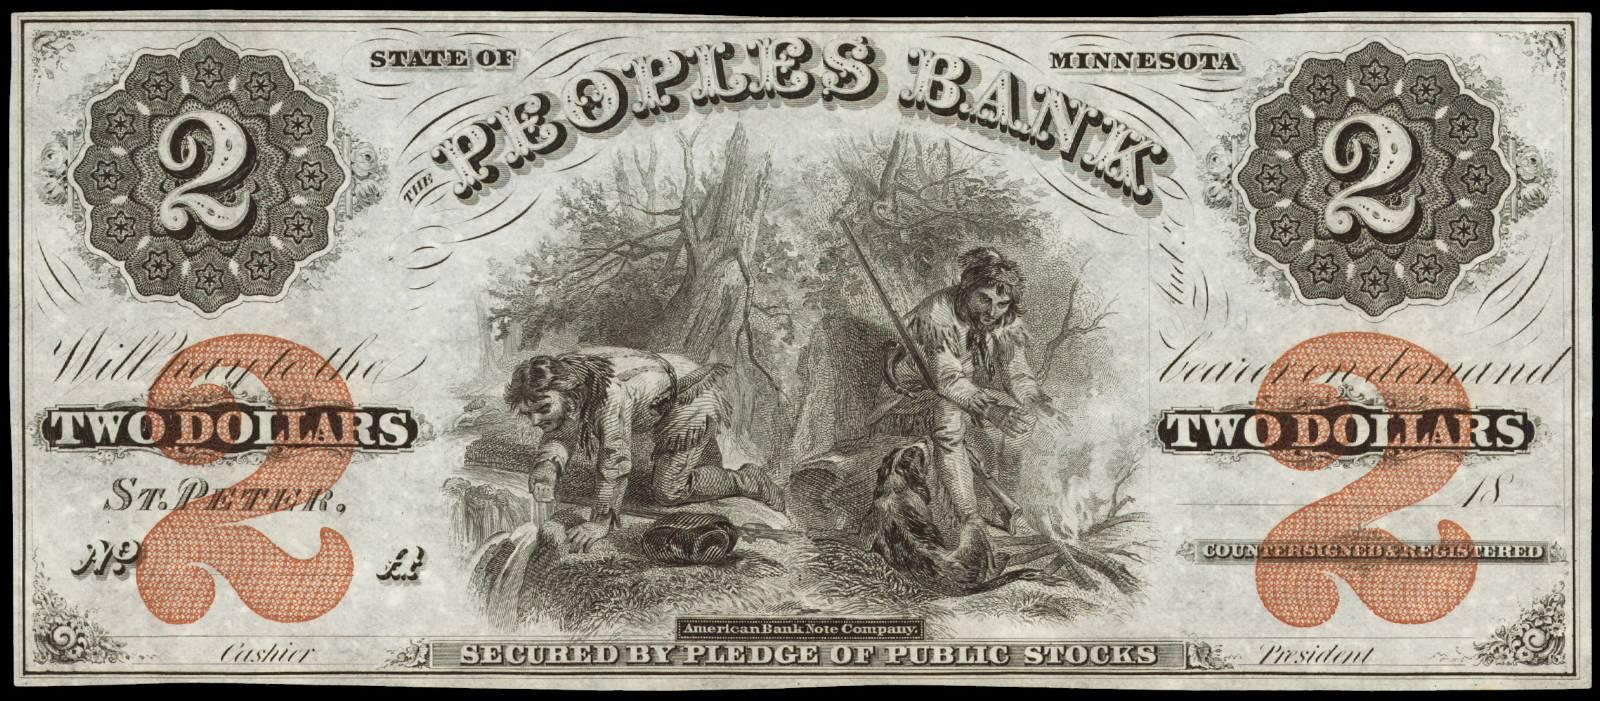 $2 Peoples Bank